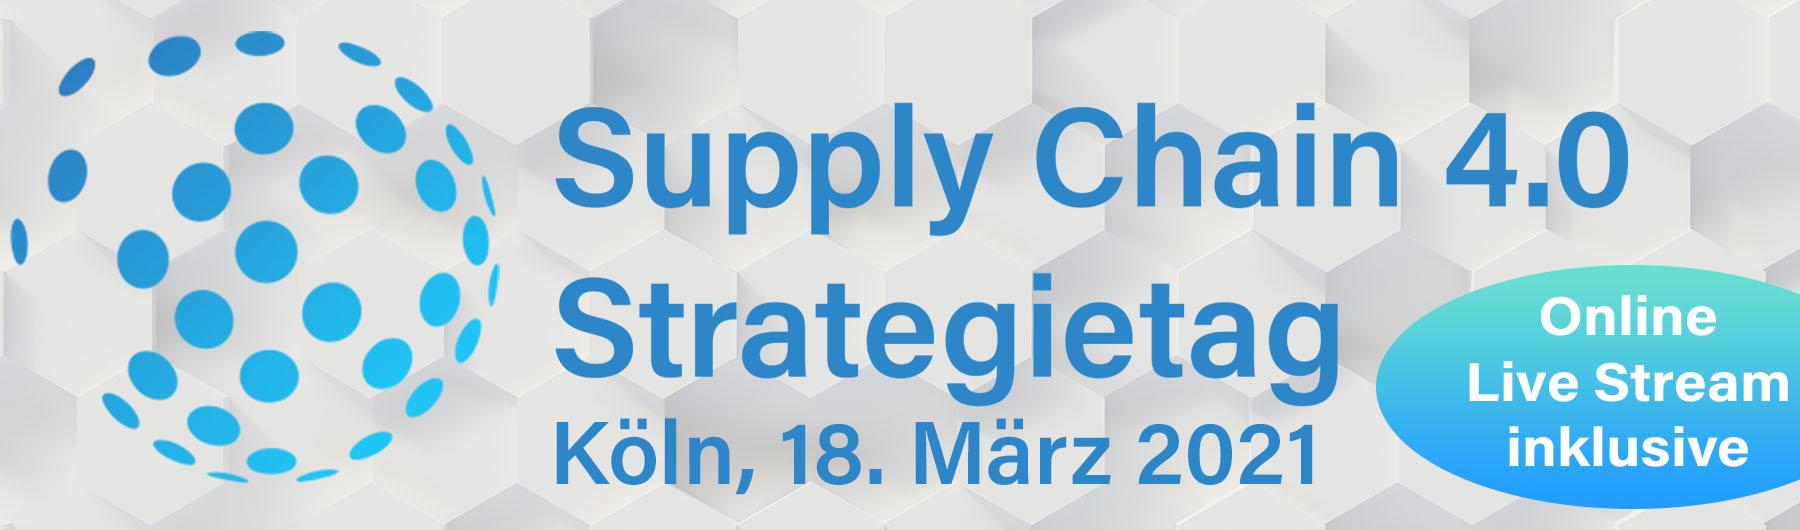 Supply Chain 4.0 Strategietag